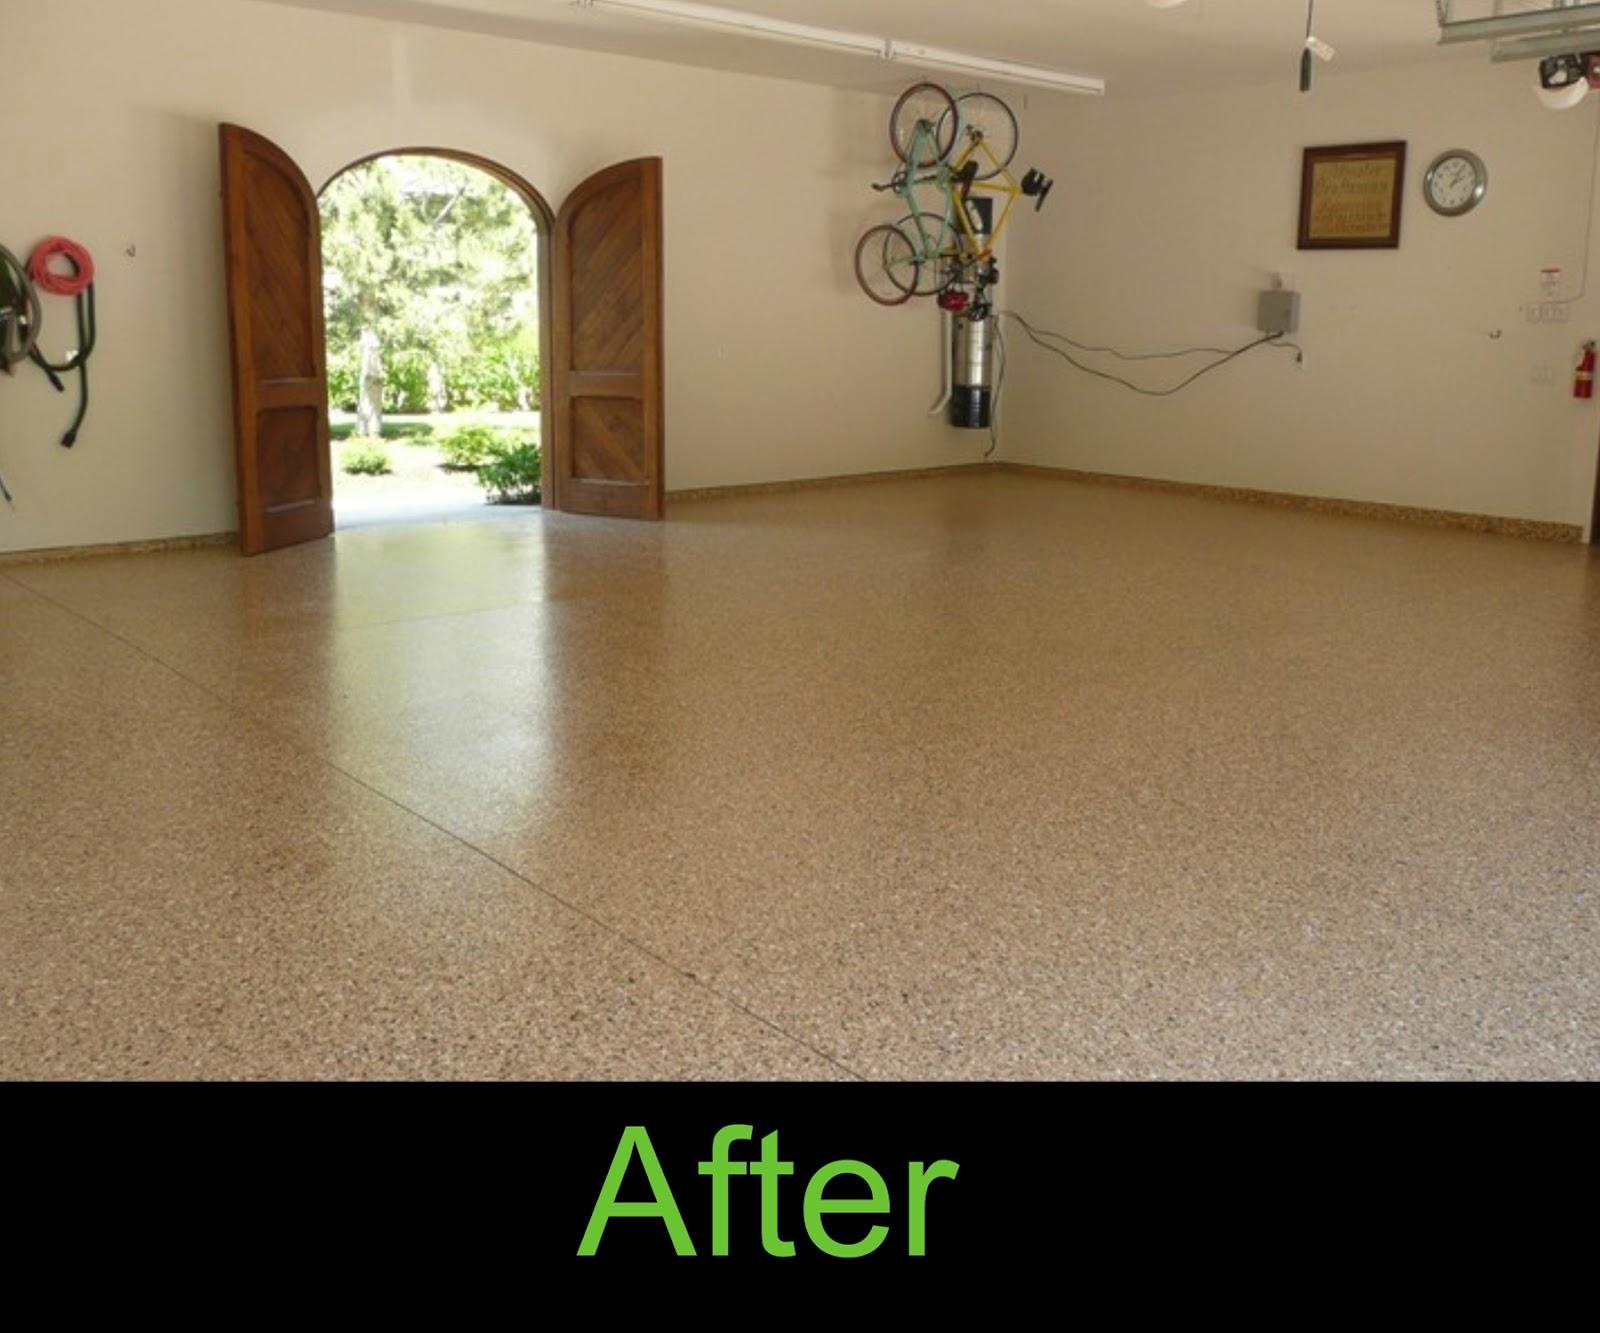 Huntsville madison alabama epoxy garage flooring choices and options thursday june 7 2012 solutioingenieria Images